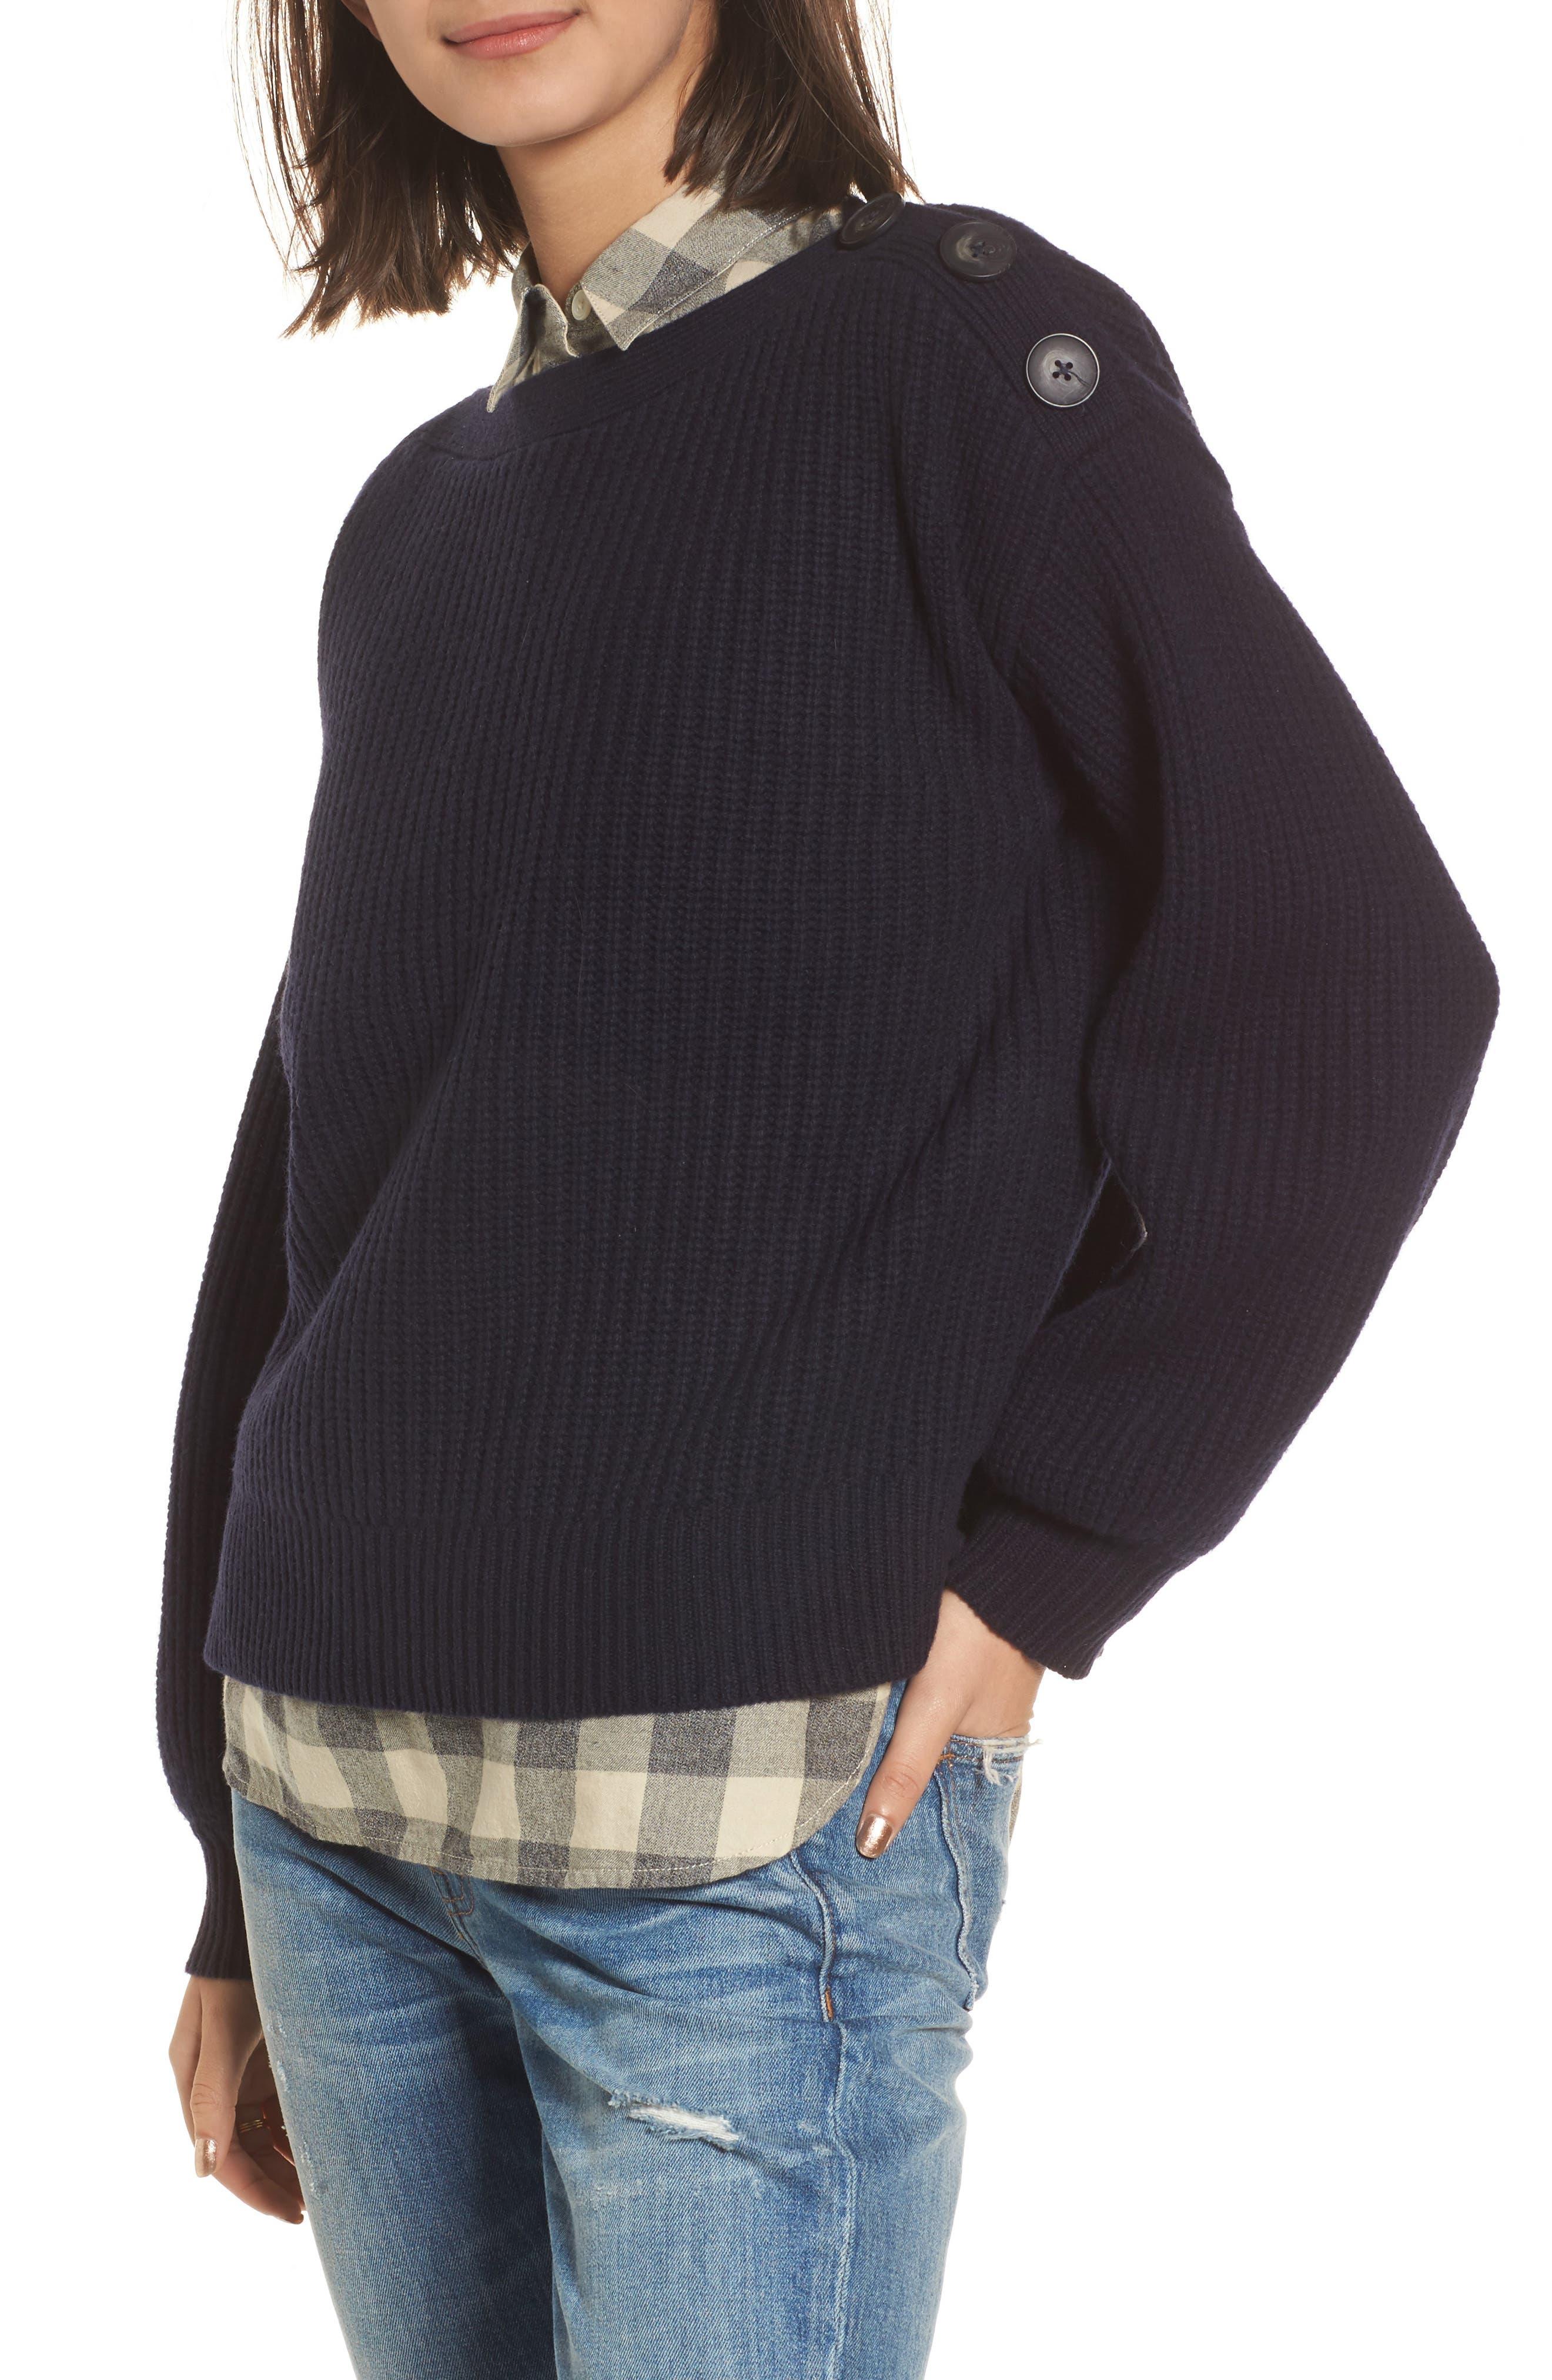 Madewell Boatneck Bubble Sleeve Sweater